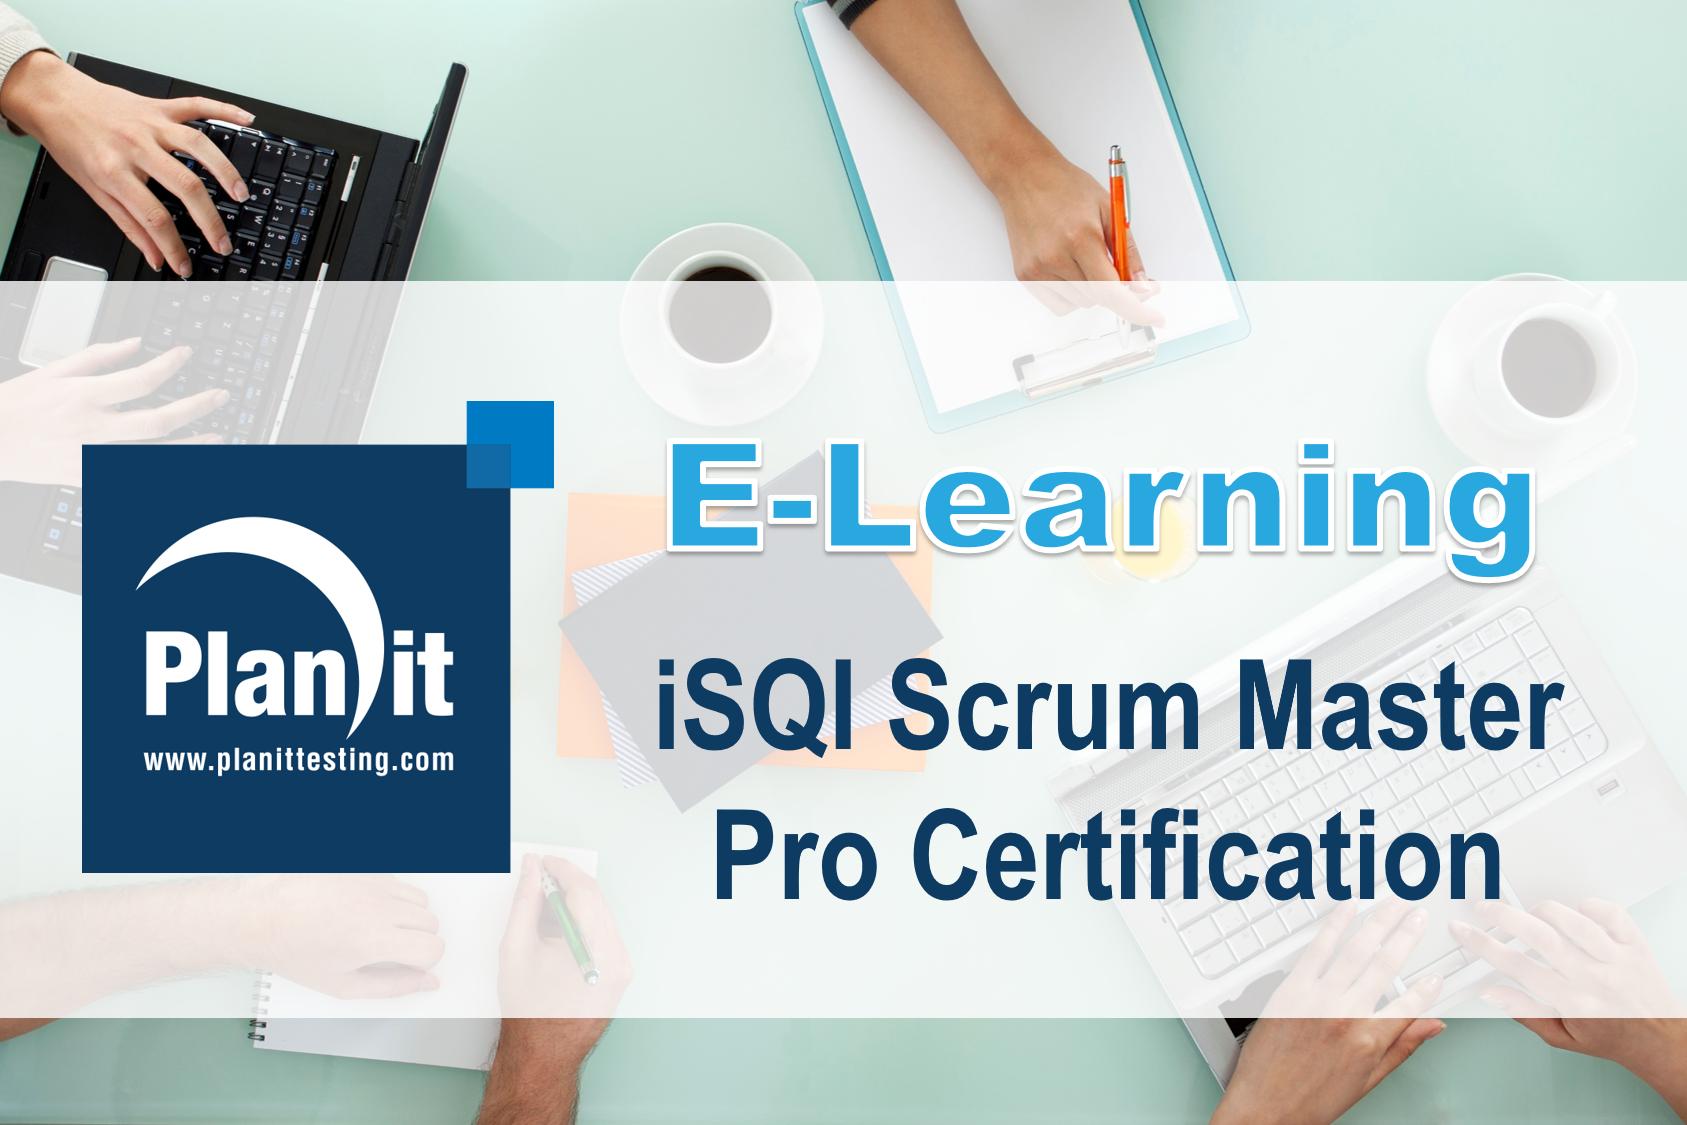 iSQI Scrum Master Pro Certification - Course Summary